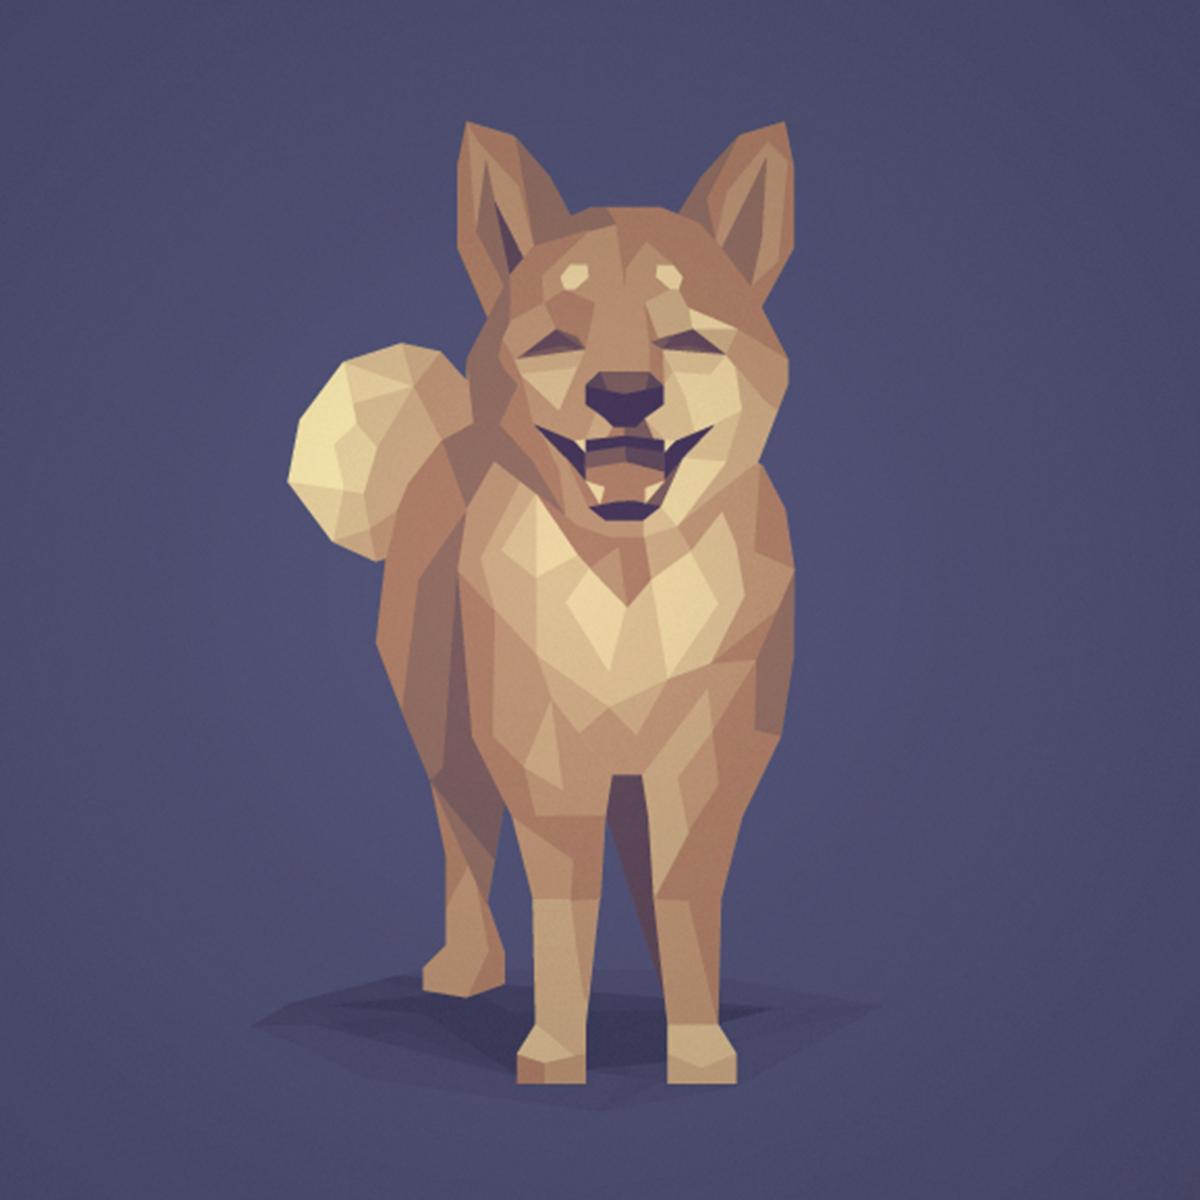 lowpoly-doggo-thumb.png